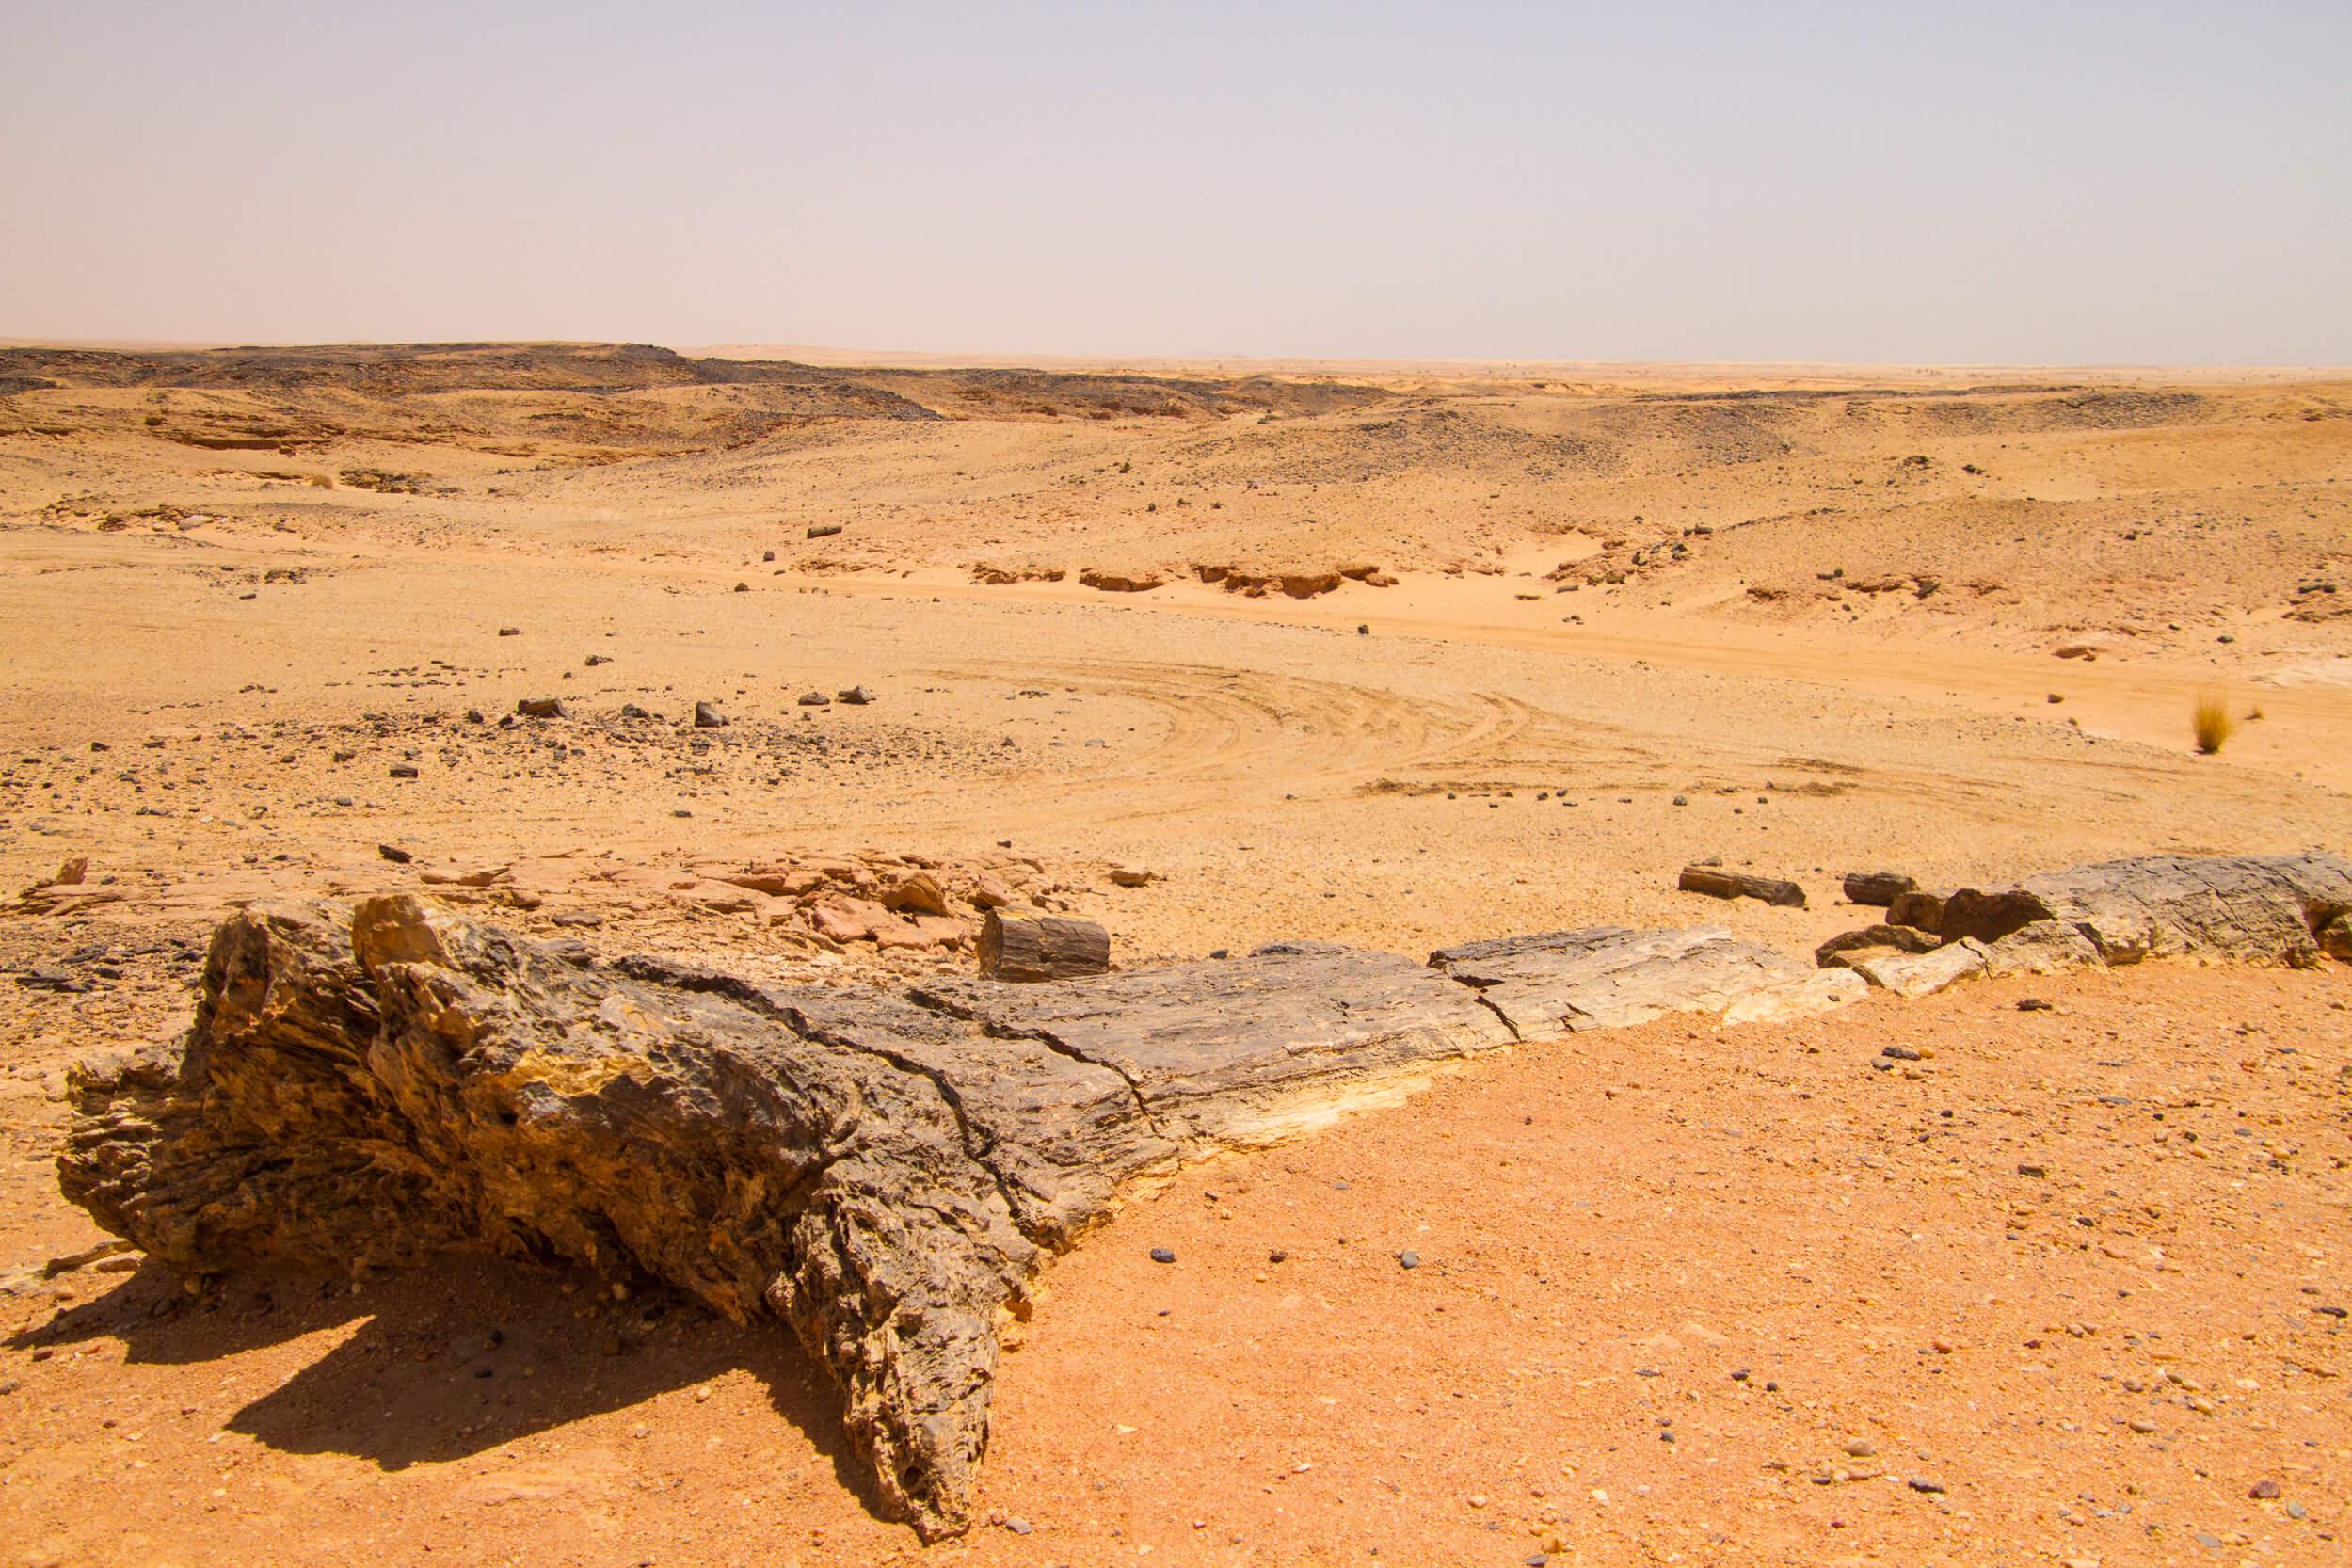 https://bubo.sk/uploads/galleries/7407/marekmeluch_sudan_petrifiedforest_karima.jpg